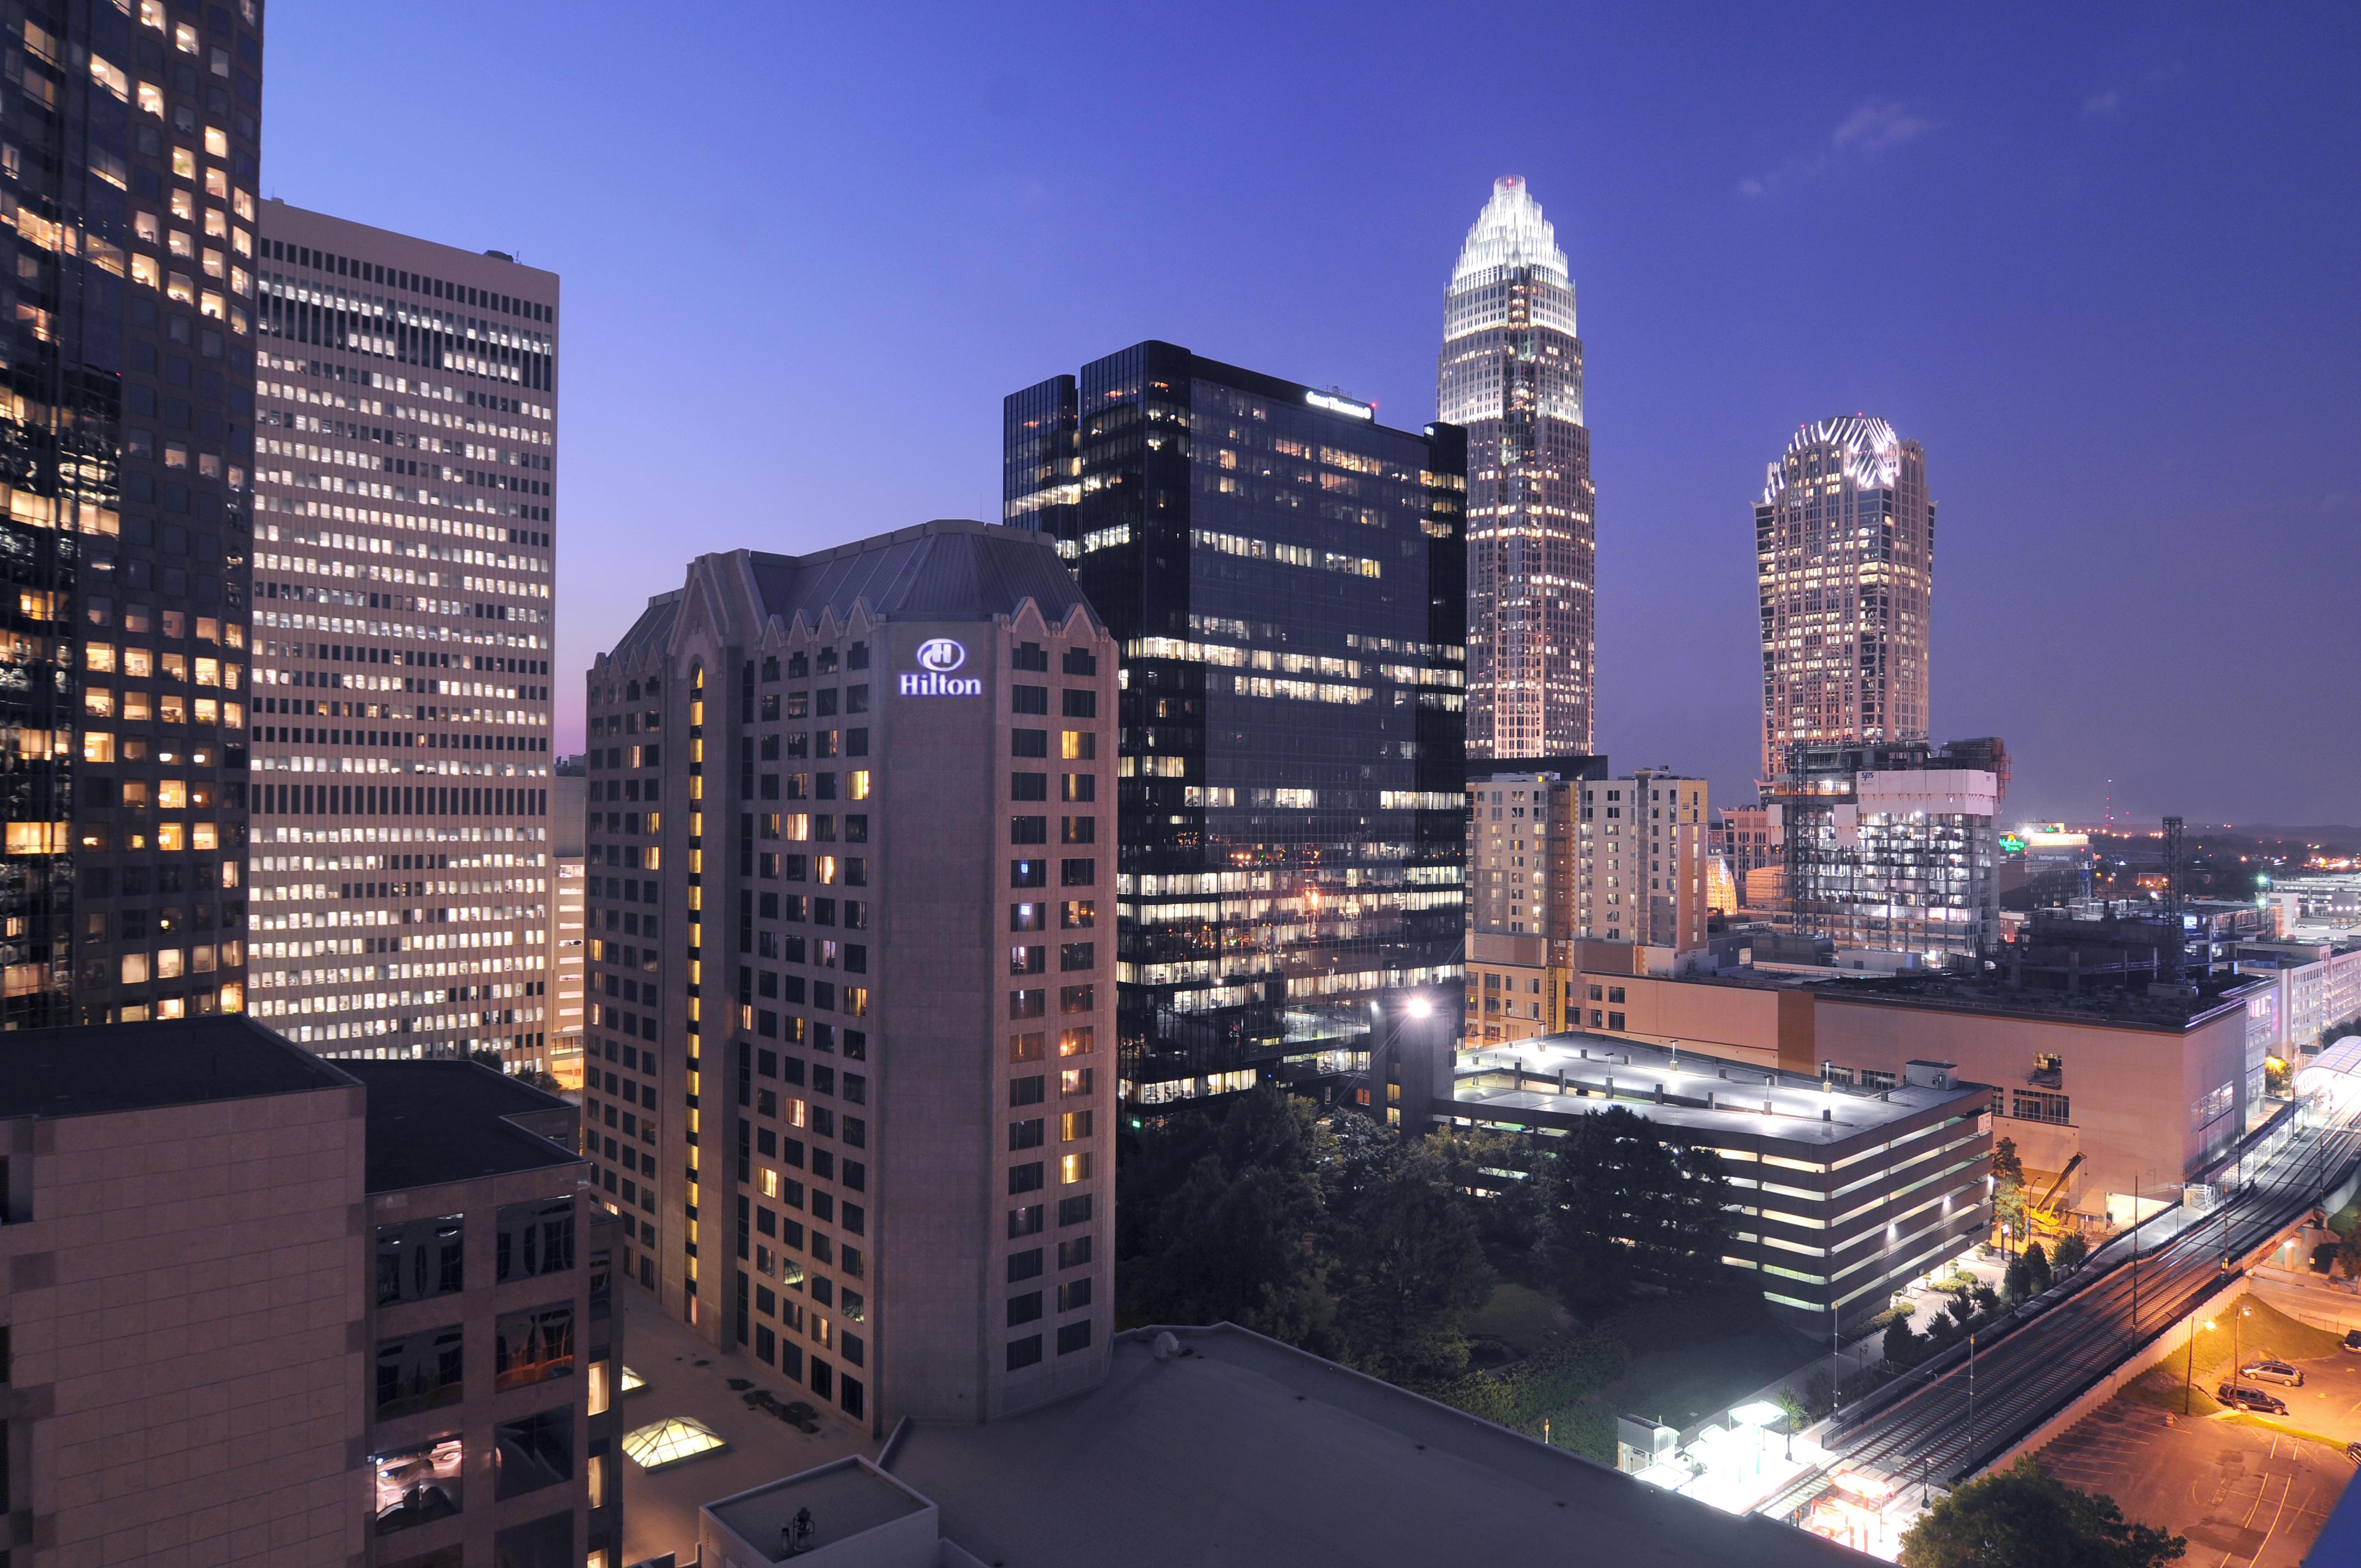 Avis Car Rental Charlotte Nc: Hilton Charlotte Center City In Charlotte, NC